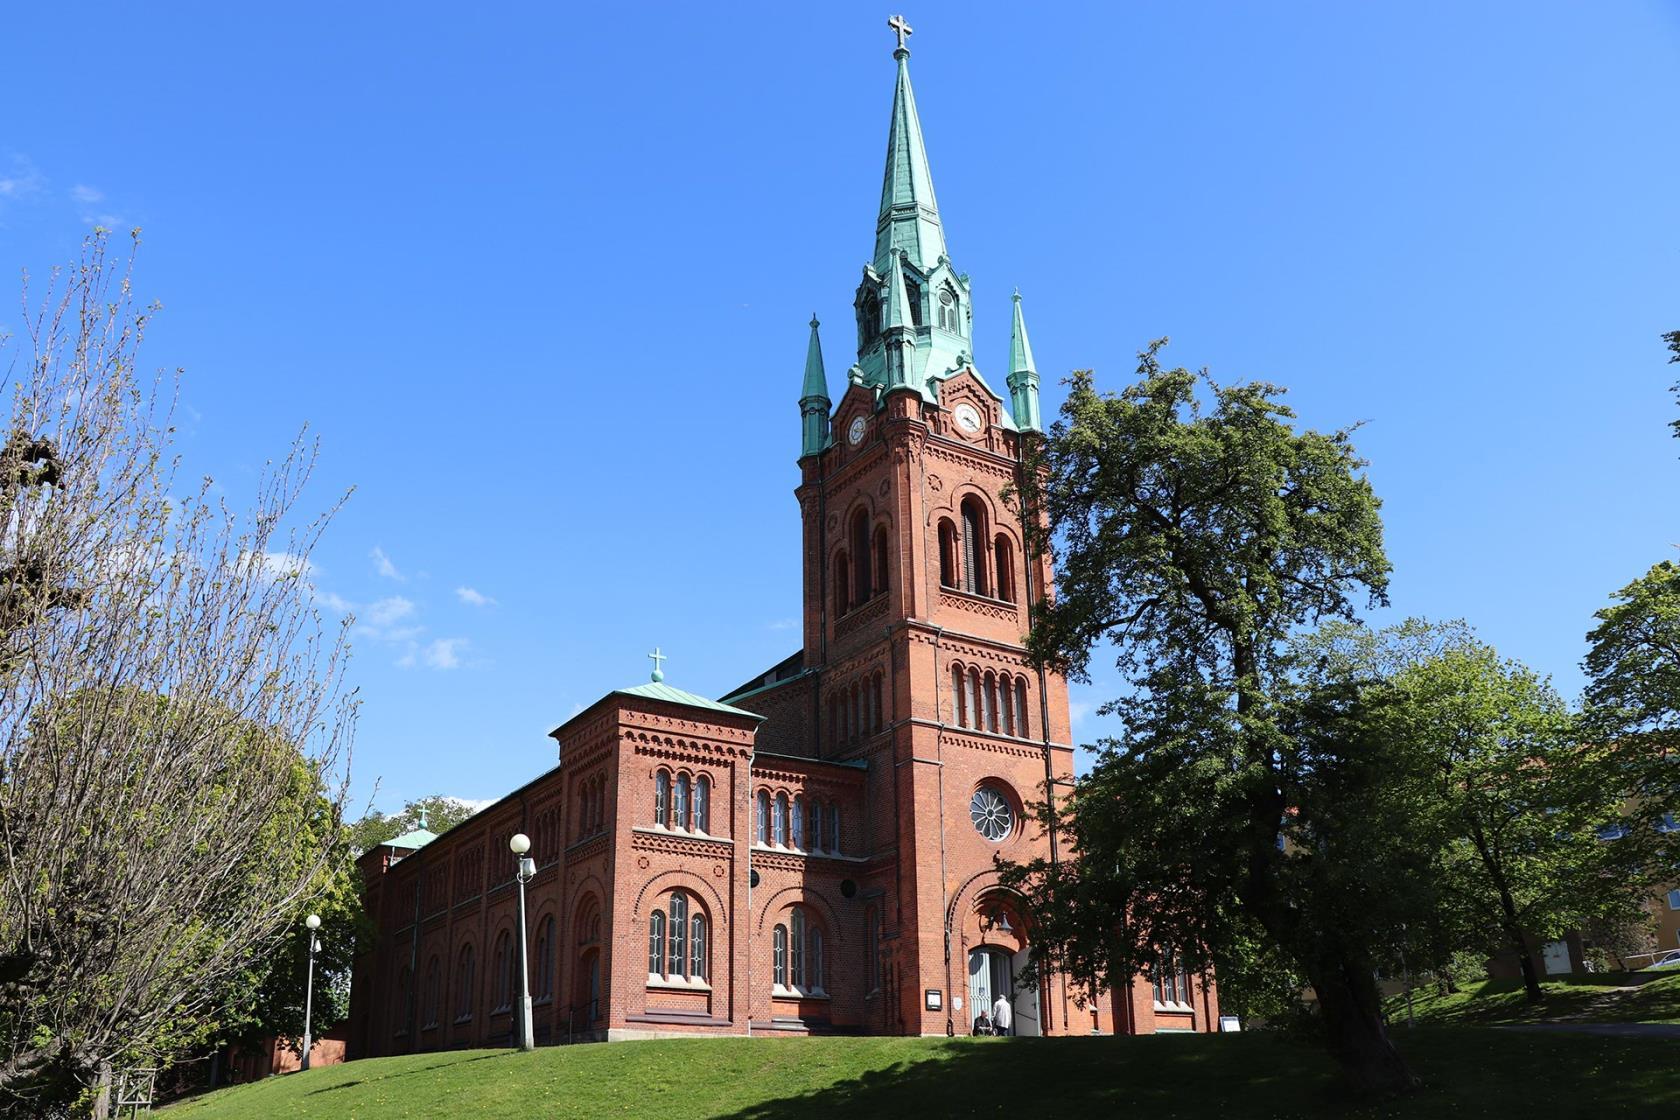 göteborgs s: t pauli hitta sex dejting svenljunga